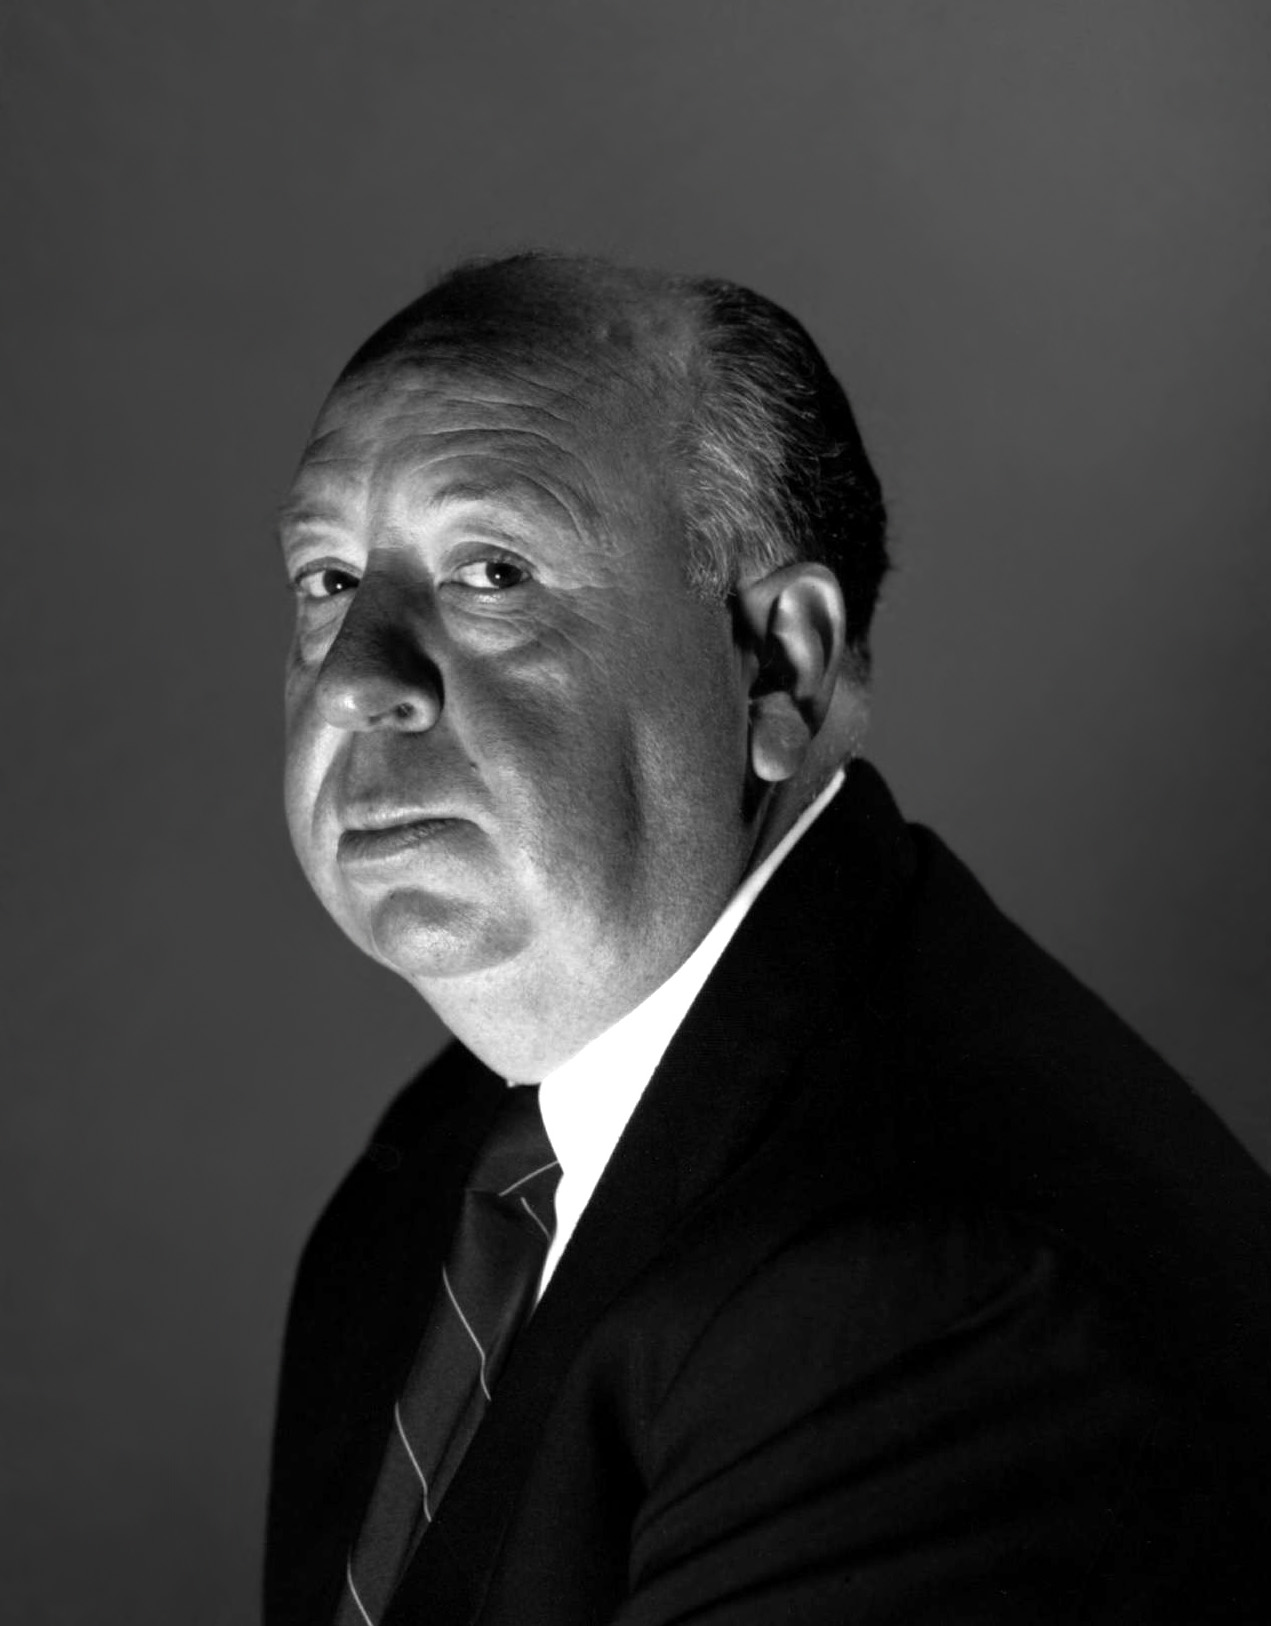 Circa 1955. British film director Alfred Hitchcock.